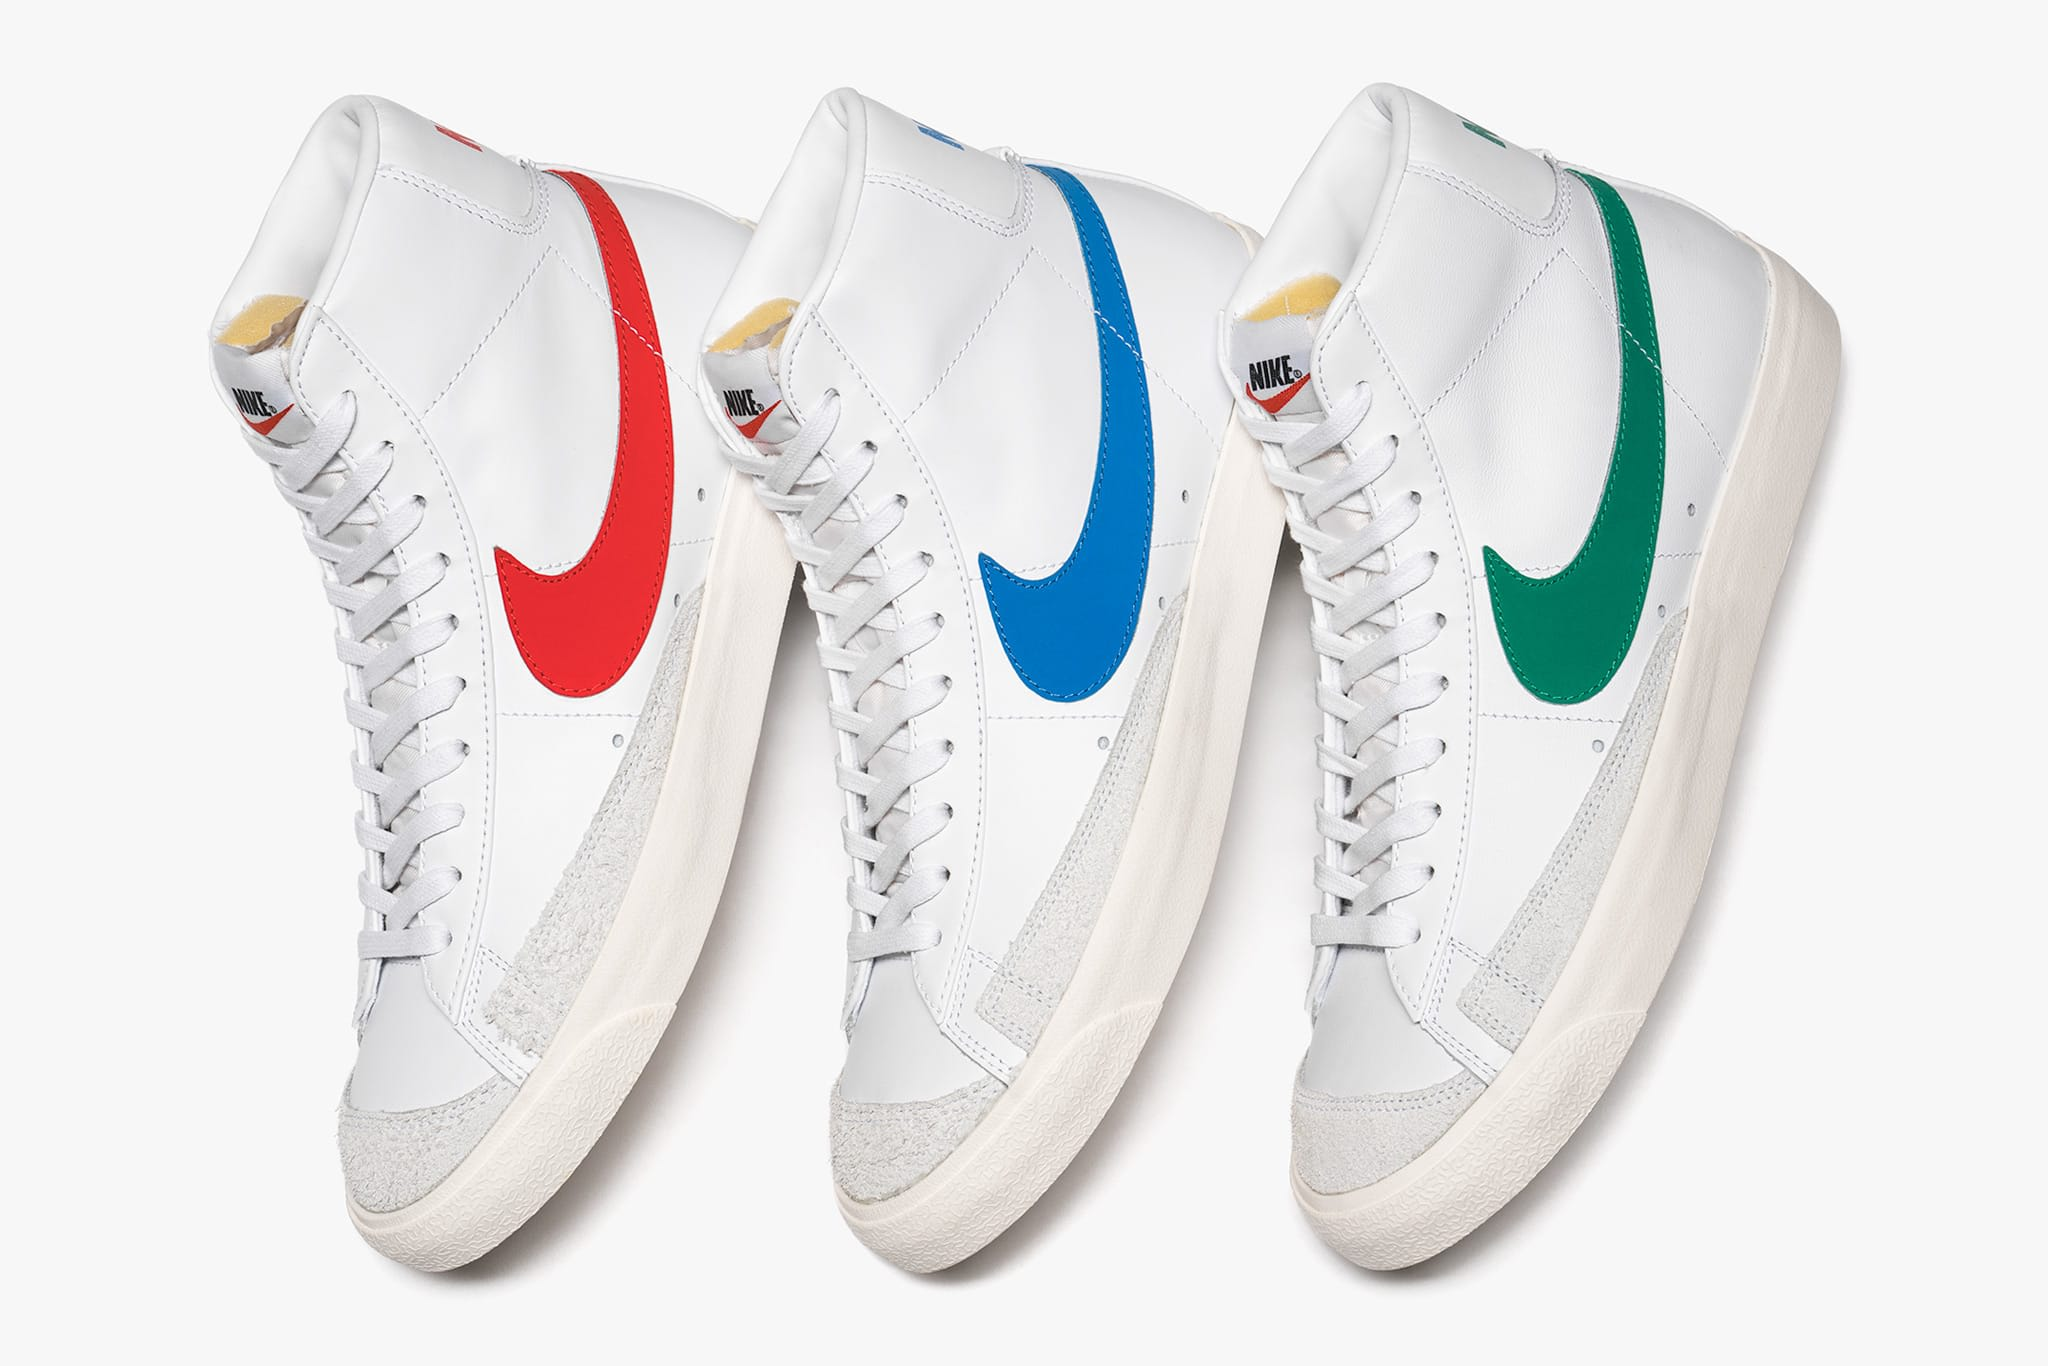 Nike Blazer Mid '77 Vintage Pack | Release Date: 01.19.19 | HAVEN